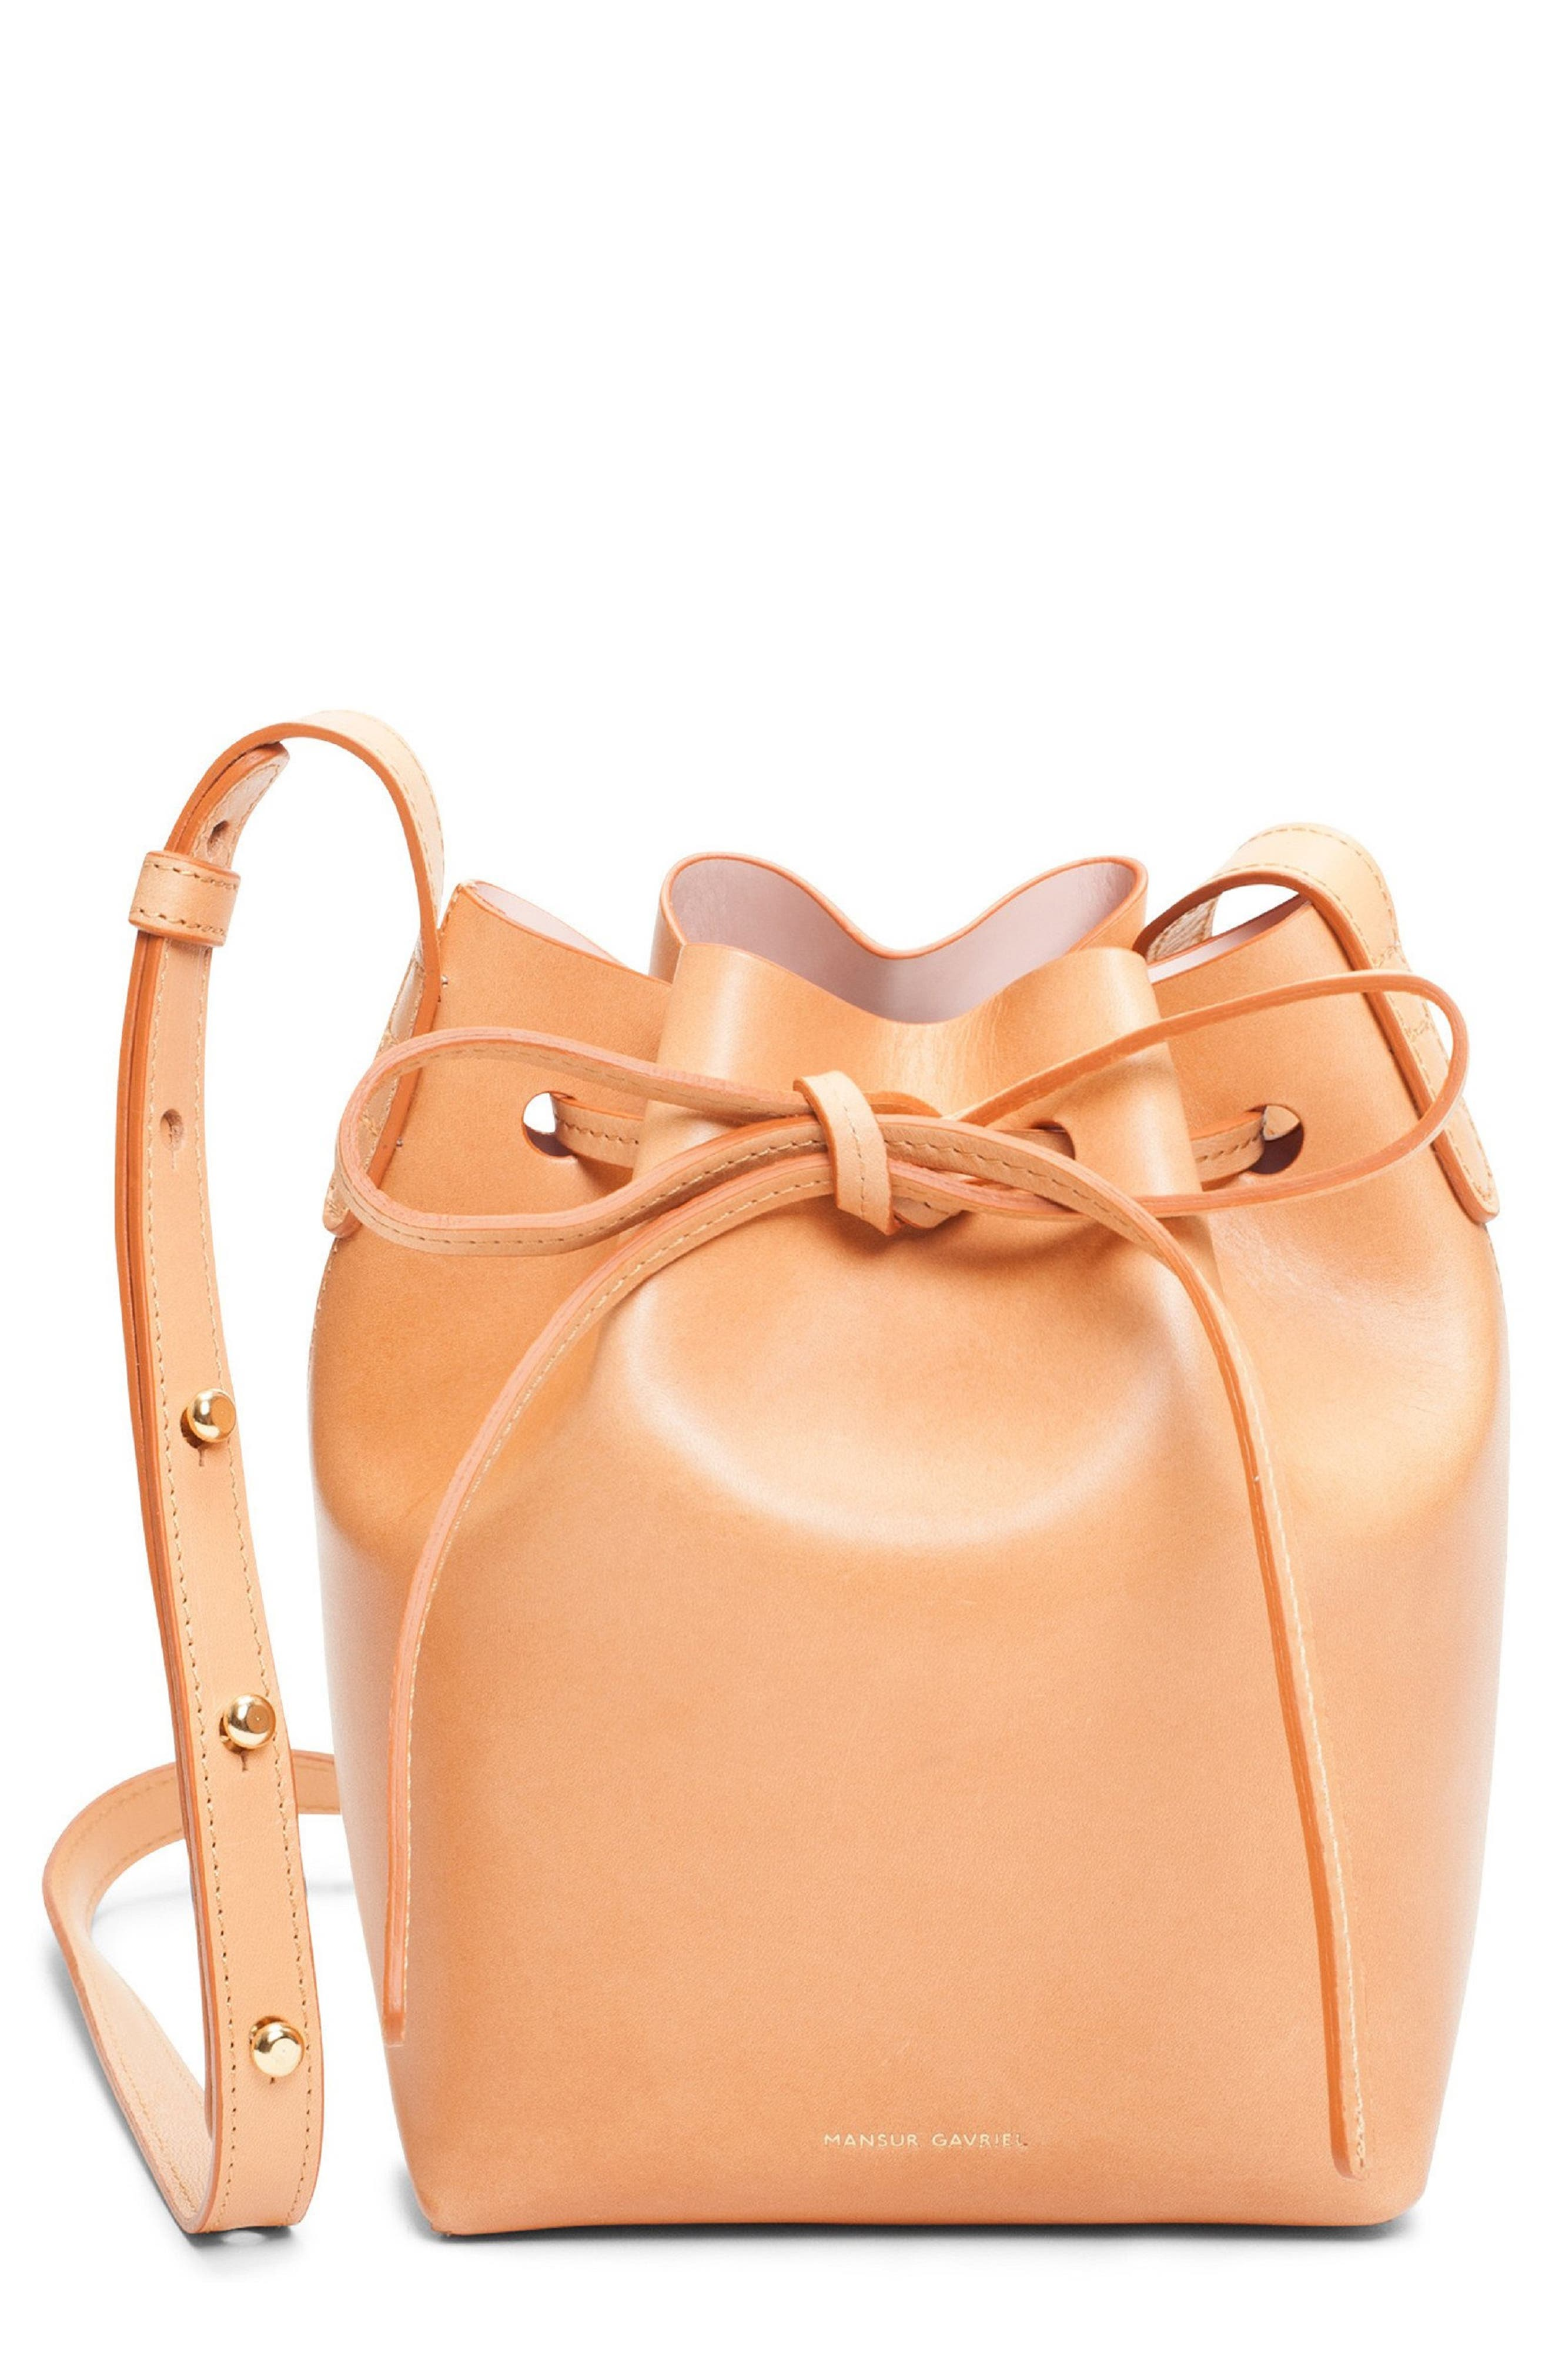 MANSUR GAVRIEL, Mini Mini Leather Bucket Bag, Main thumbnail 1, color, CAMMELLO/ ROSA